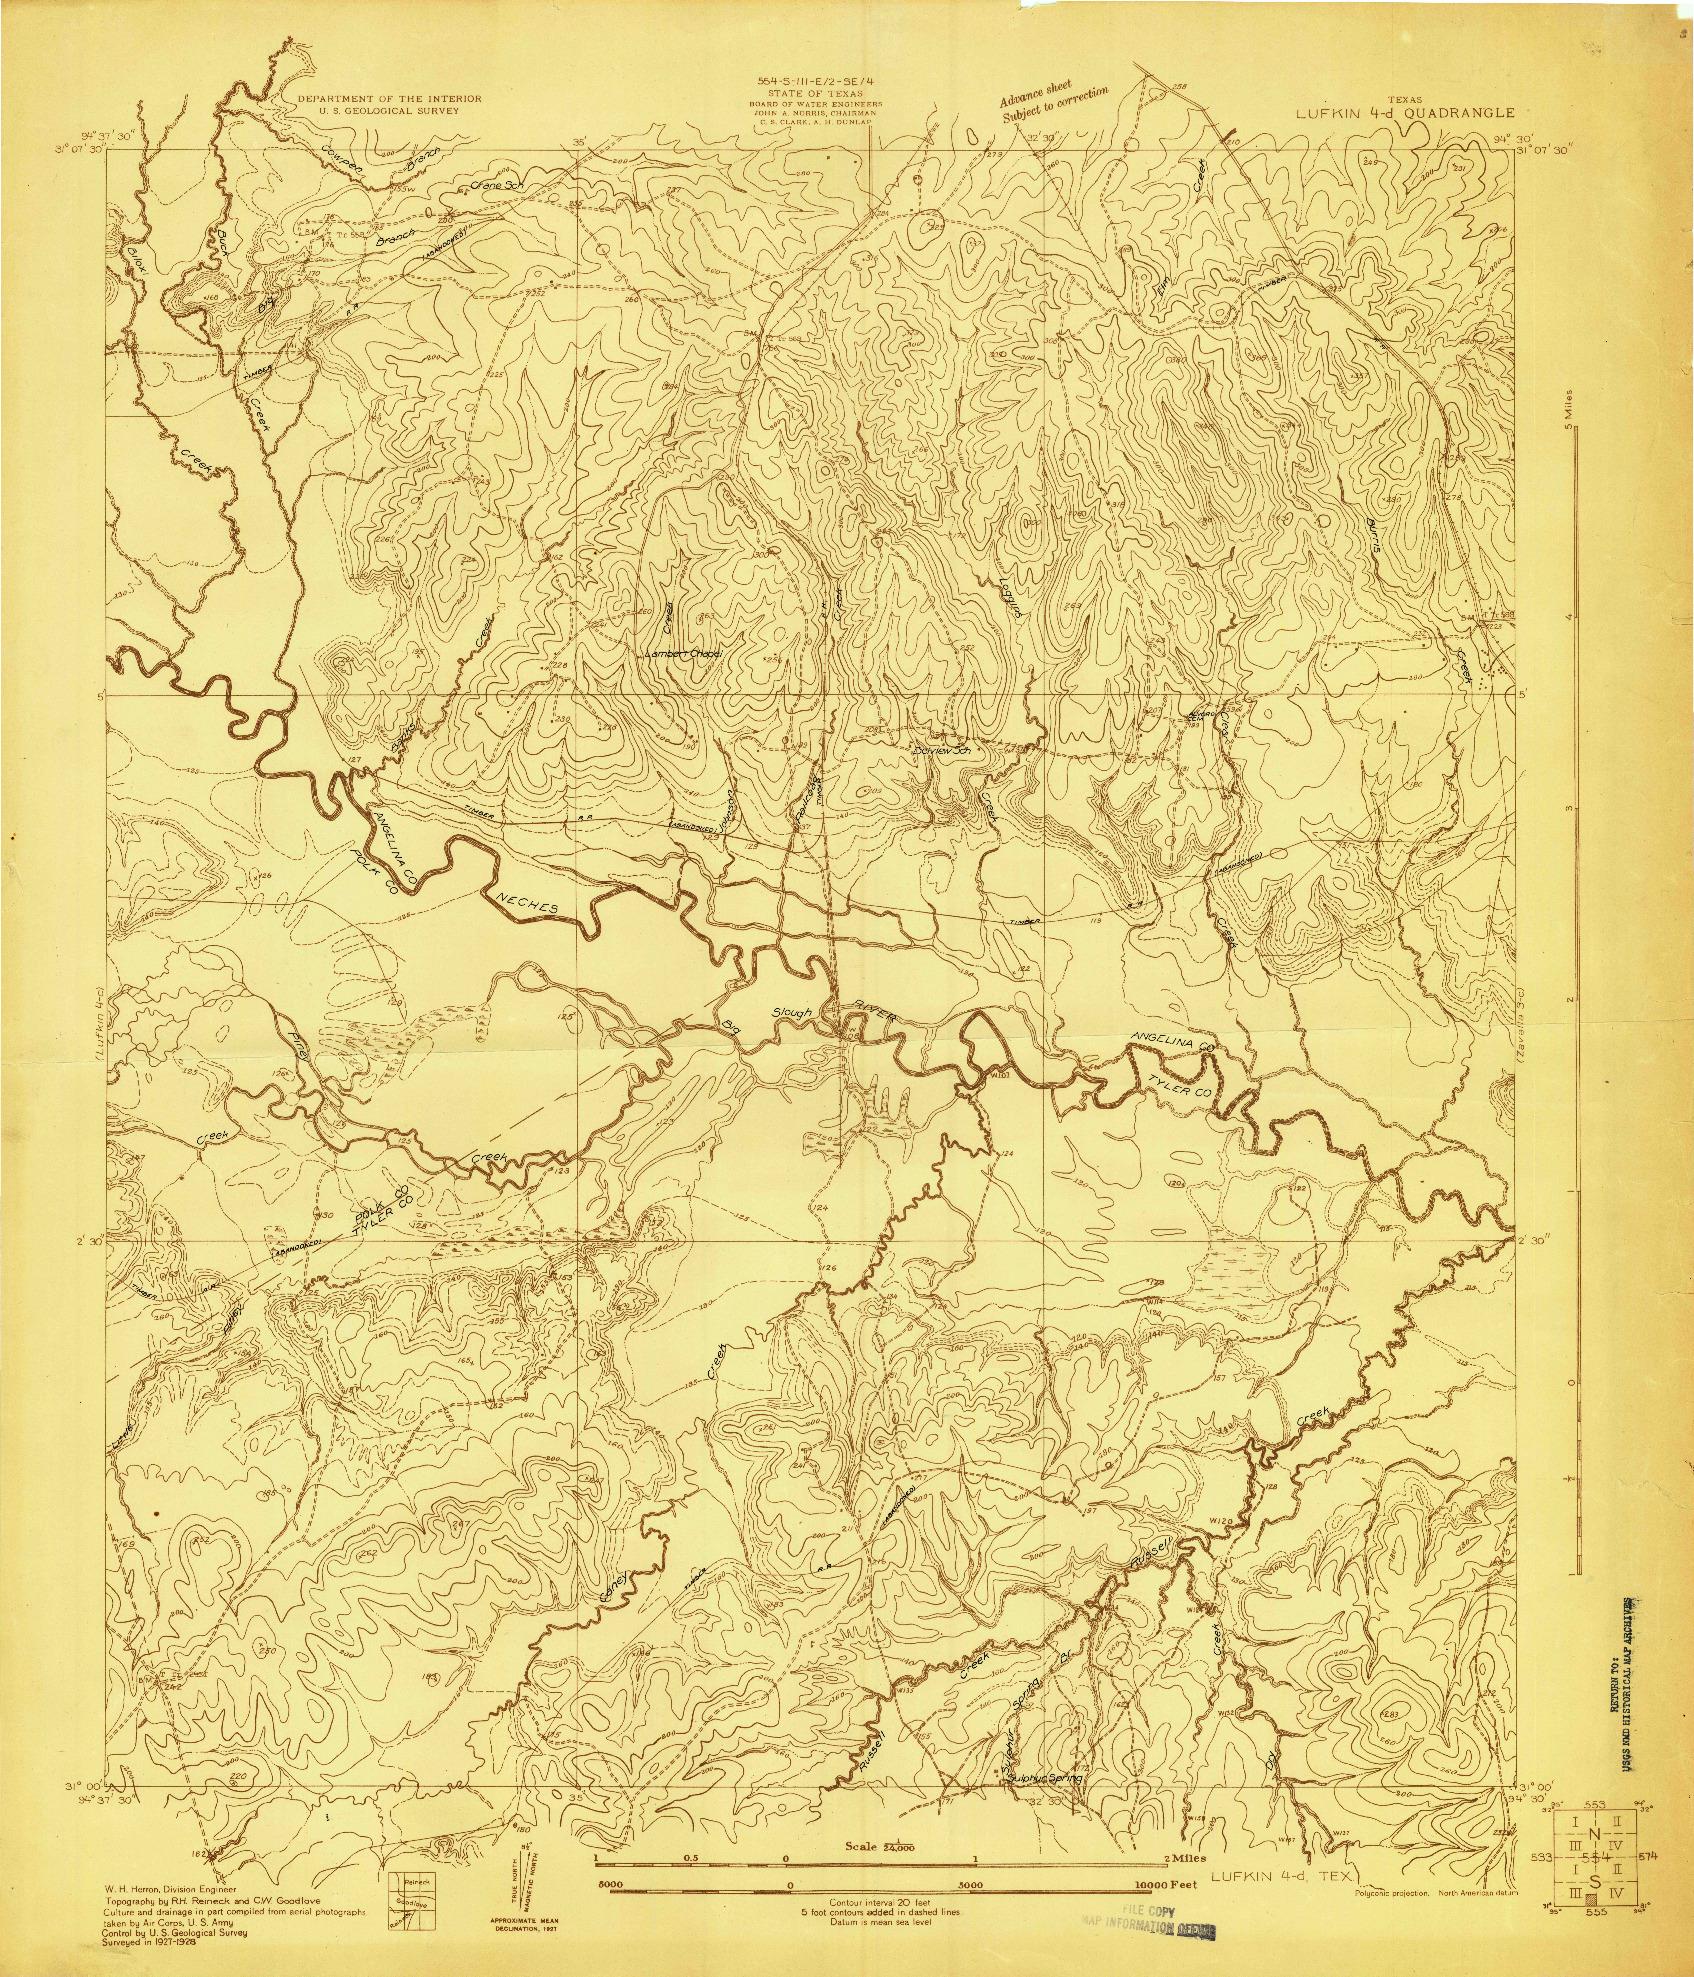 USGS 1:24000-SCALE QUADRANGLE FOR LUFKIN 4-D, TX 1928